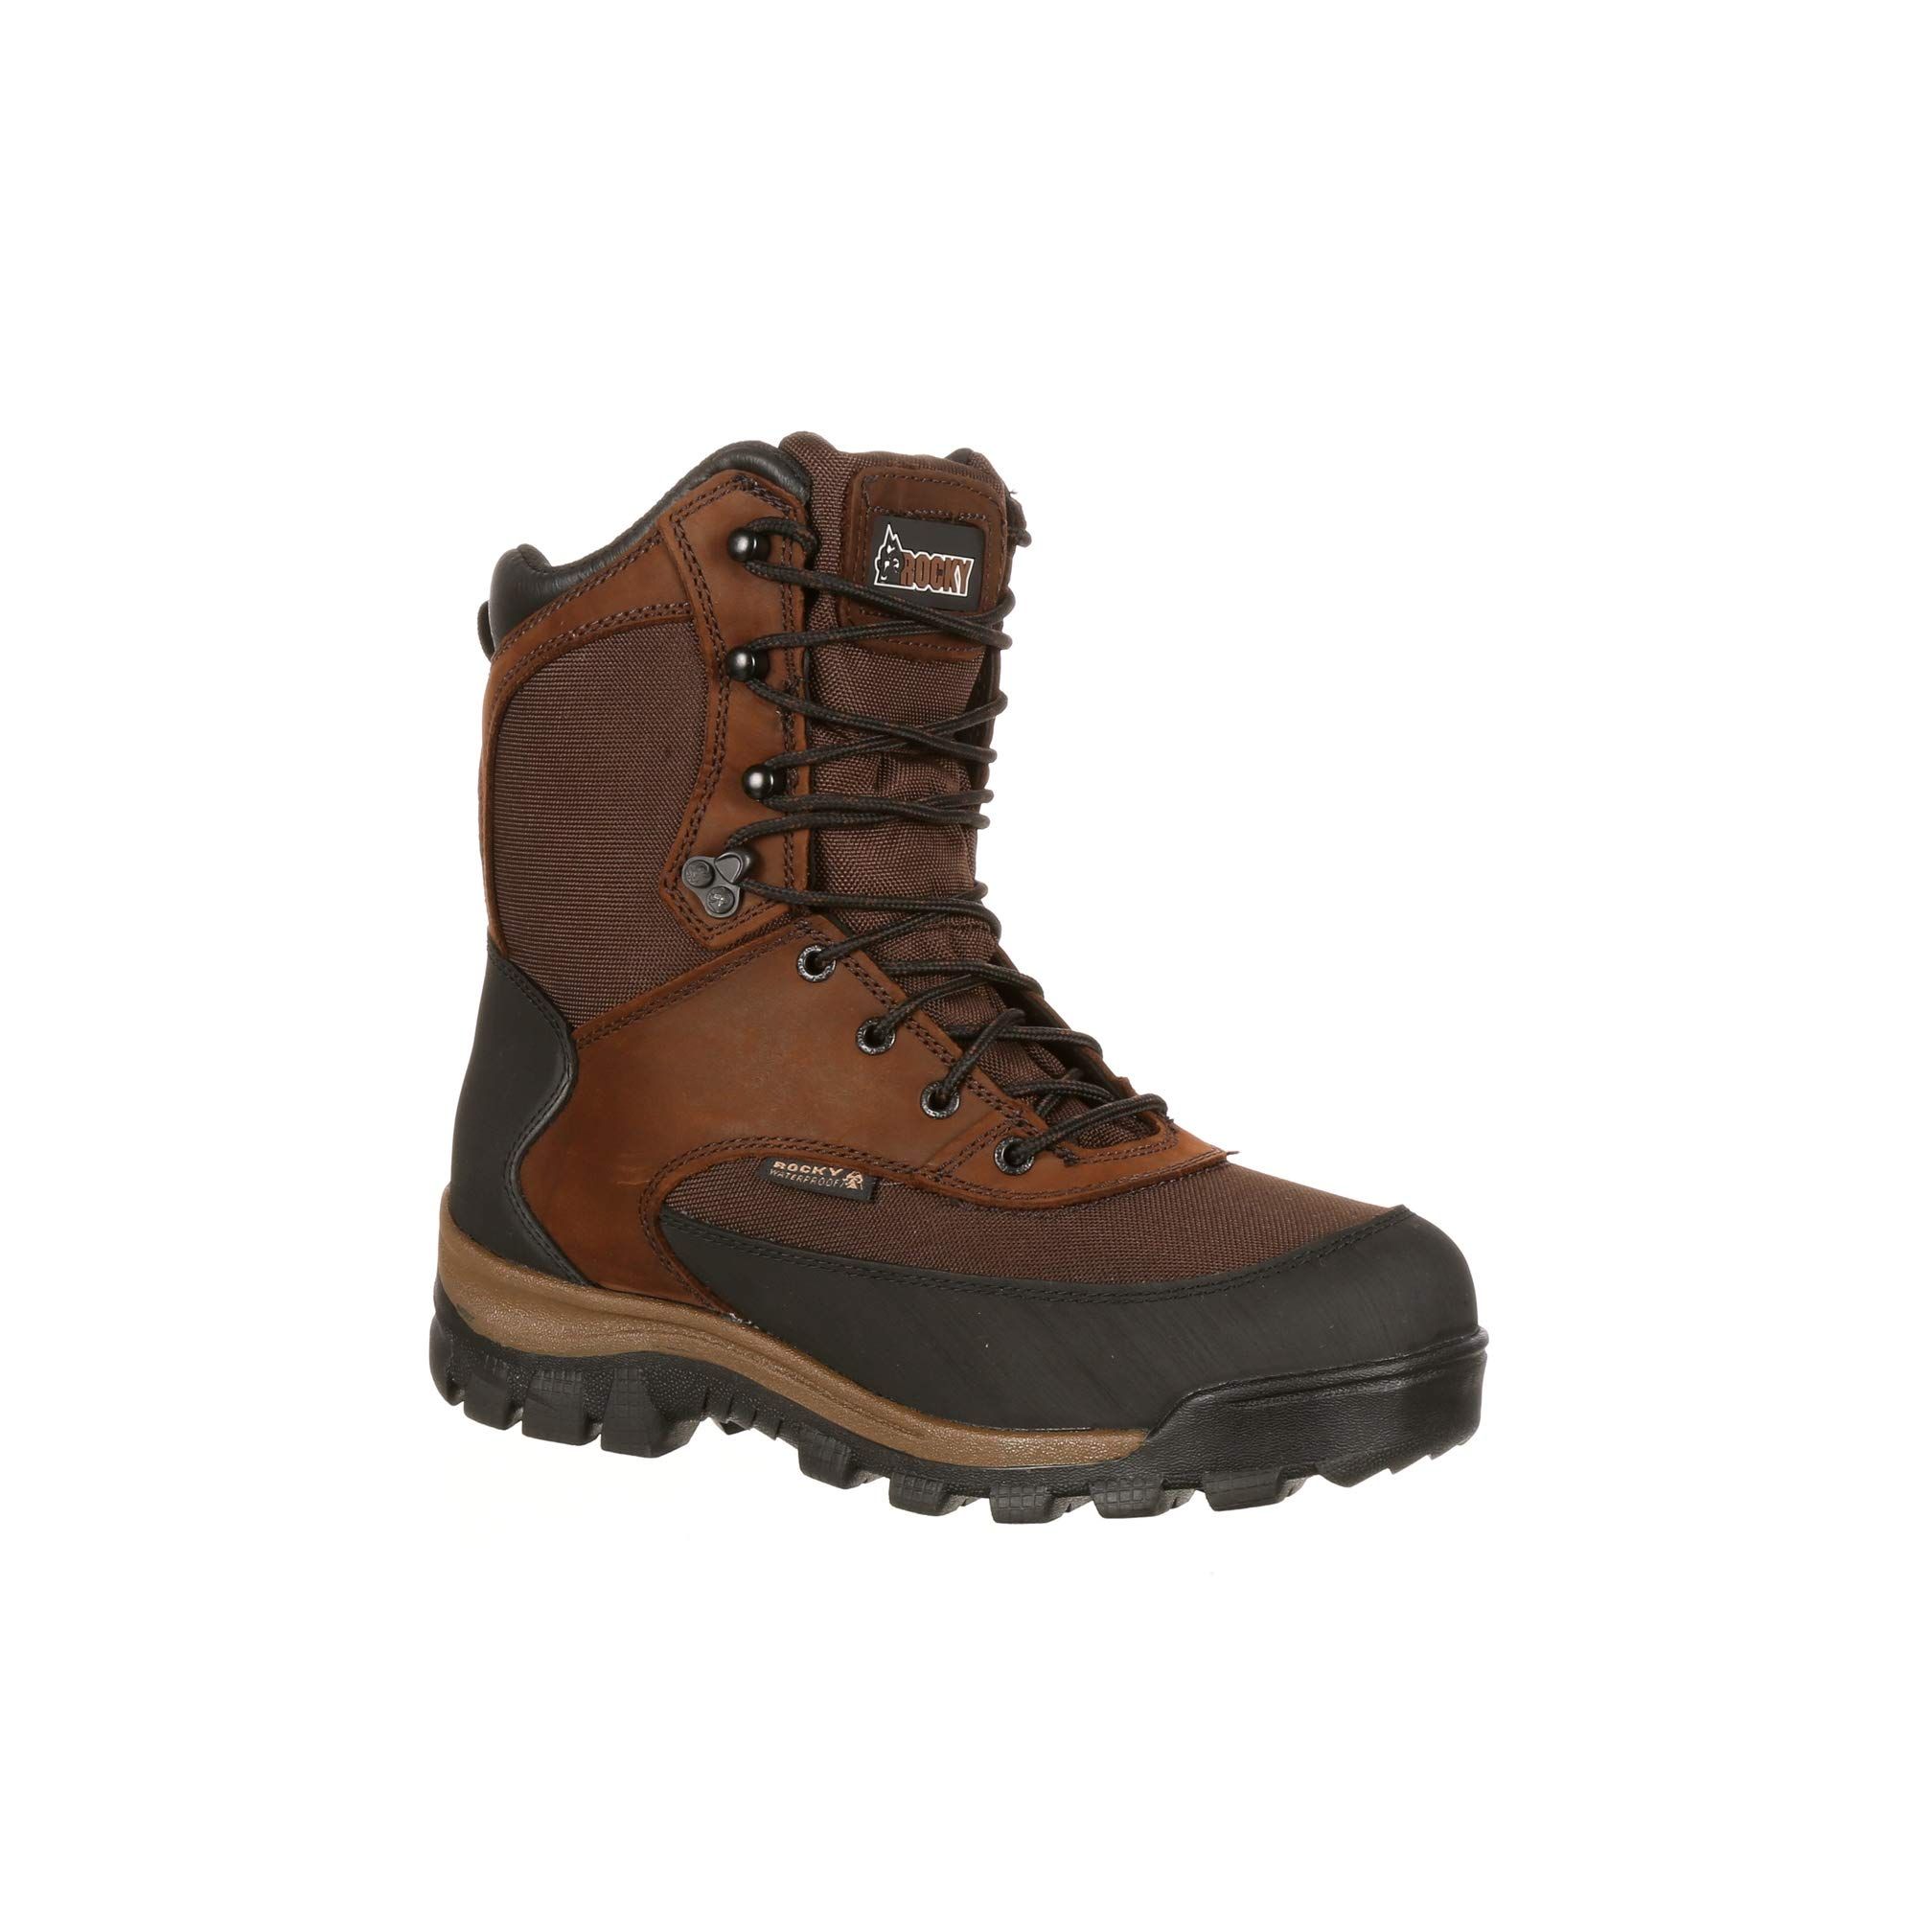 Rocky Men's 8'' Core Waterproof Insulated Outdoor Boot-FQ0004753 (M10) Brown